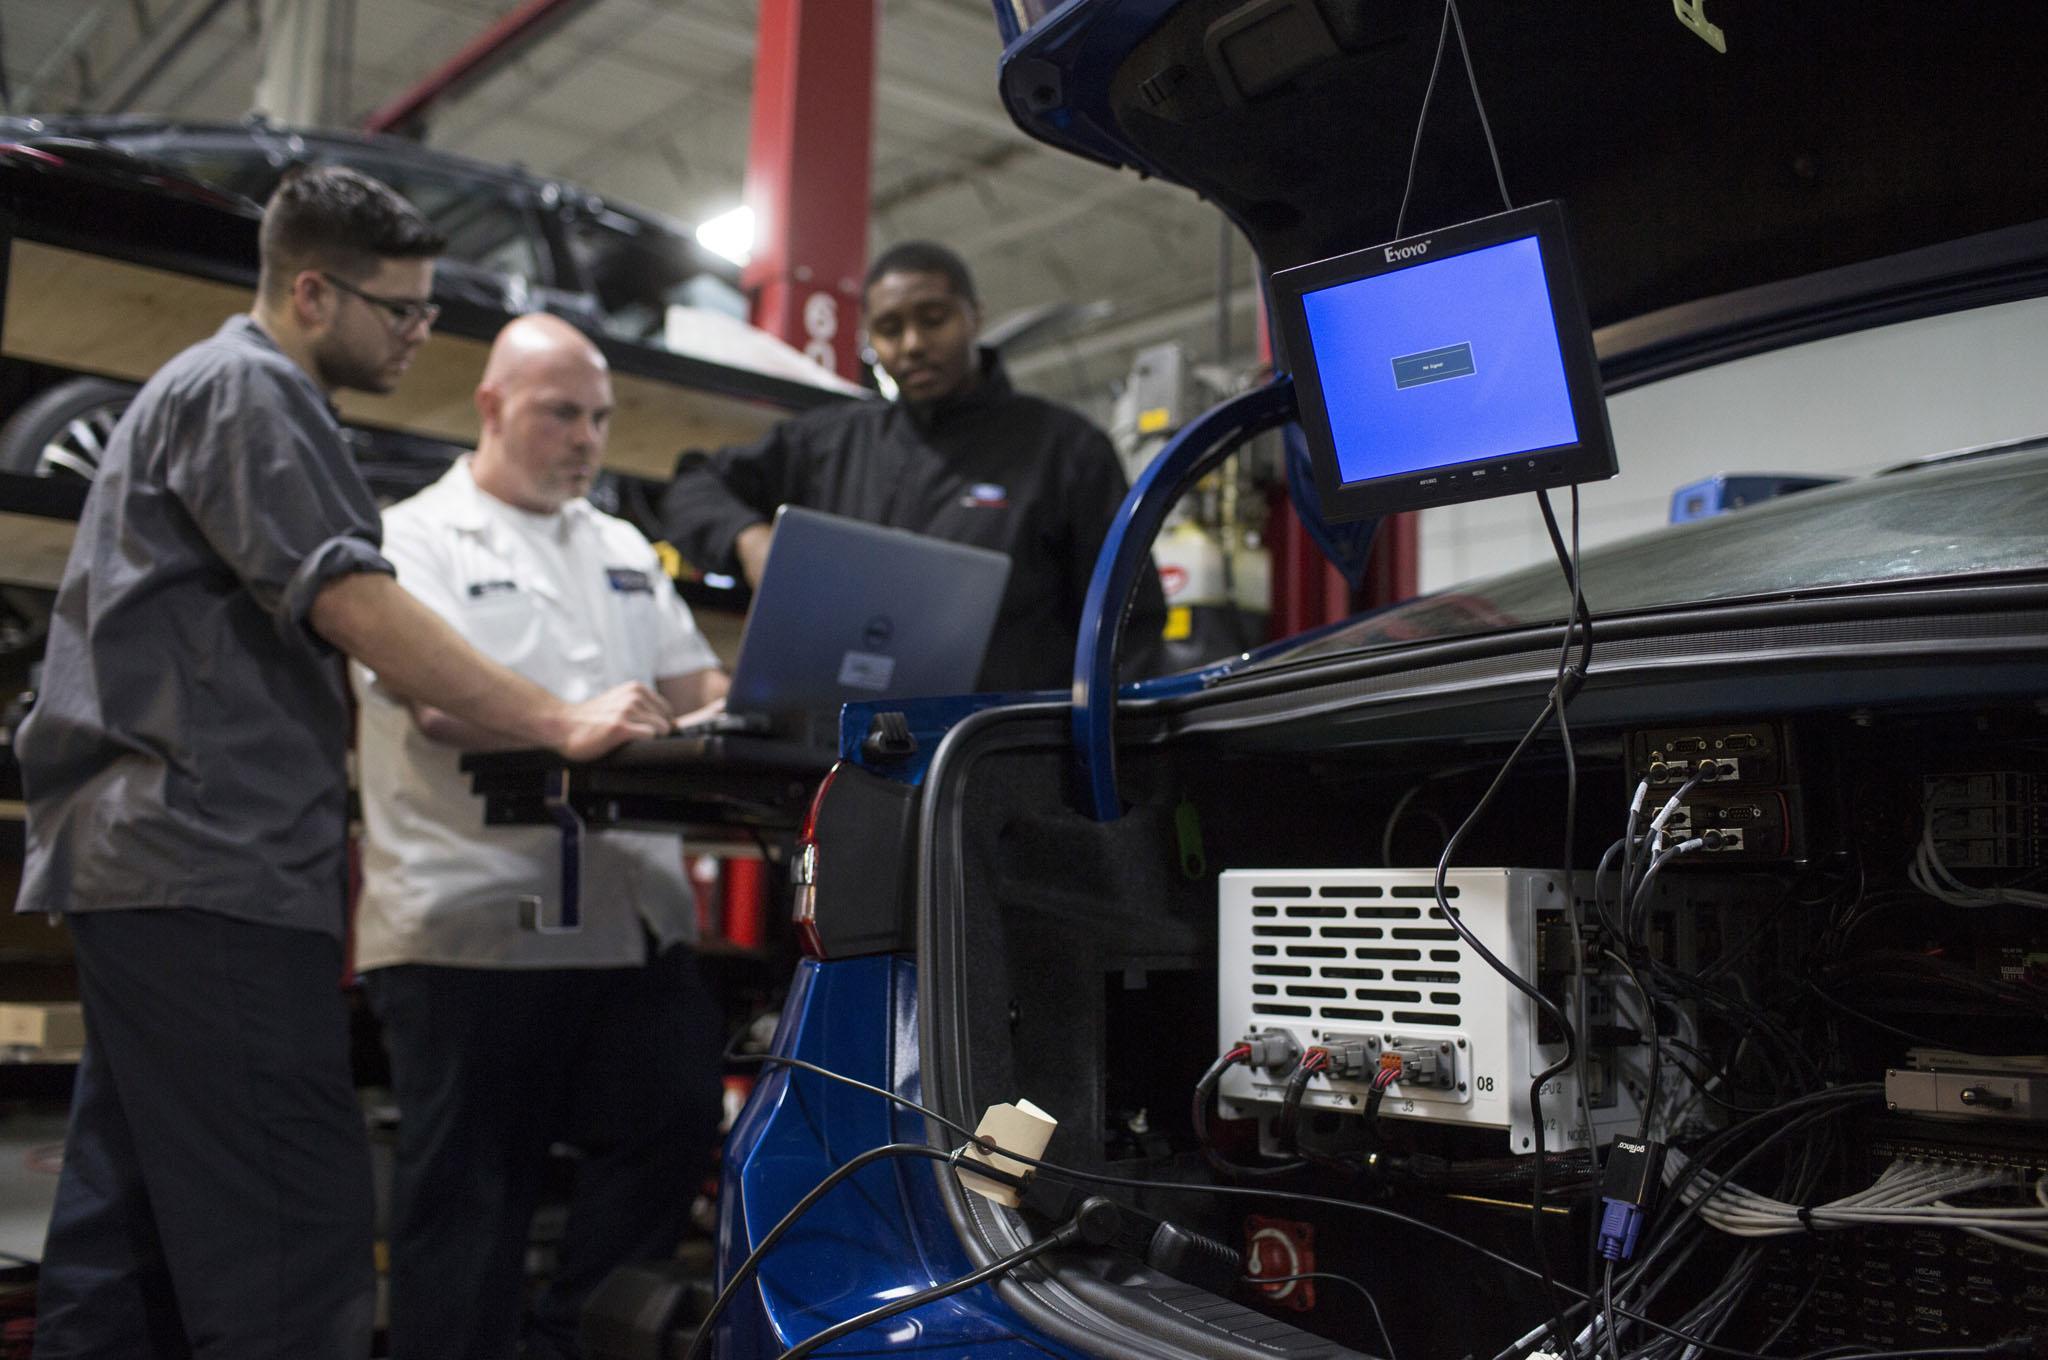 Ford Fusion Hybrid Autonomous Vehicle Brain in Trunk